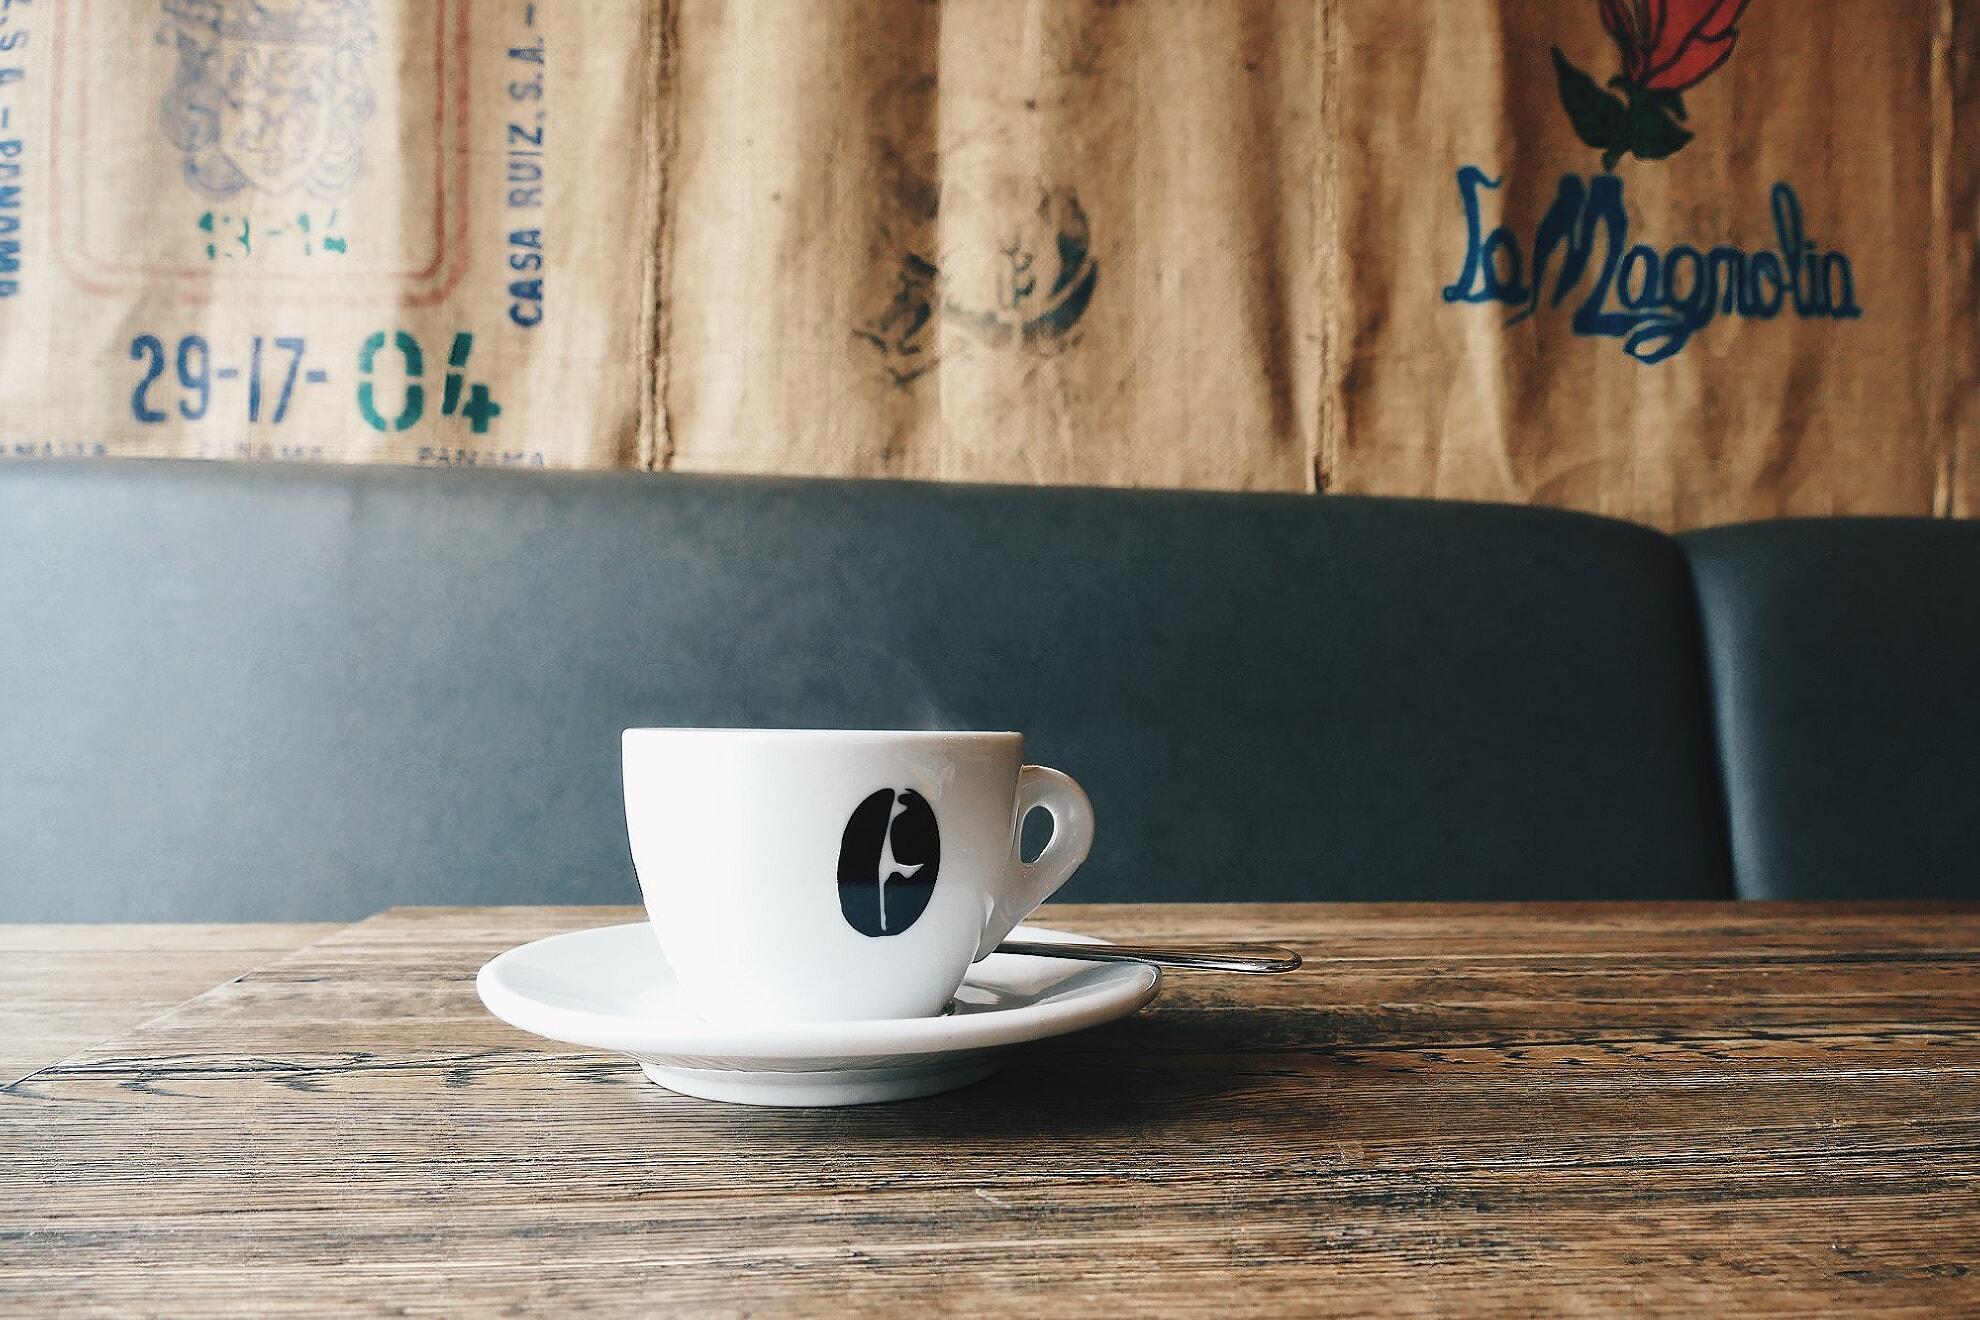 © Sylt Marketing l Julia Petersen_Tasse der Kaffeerösterei Rantum.jpg